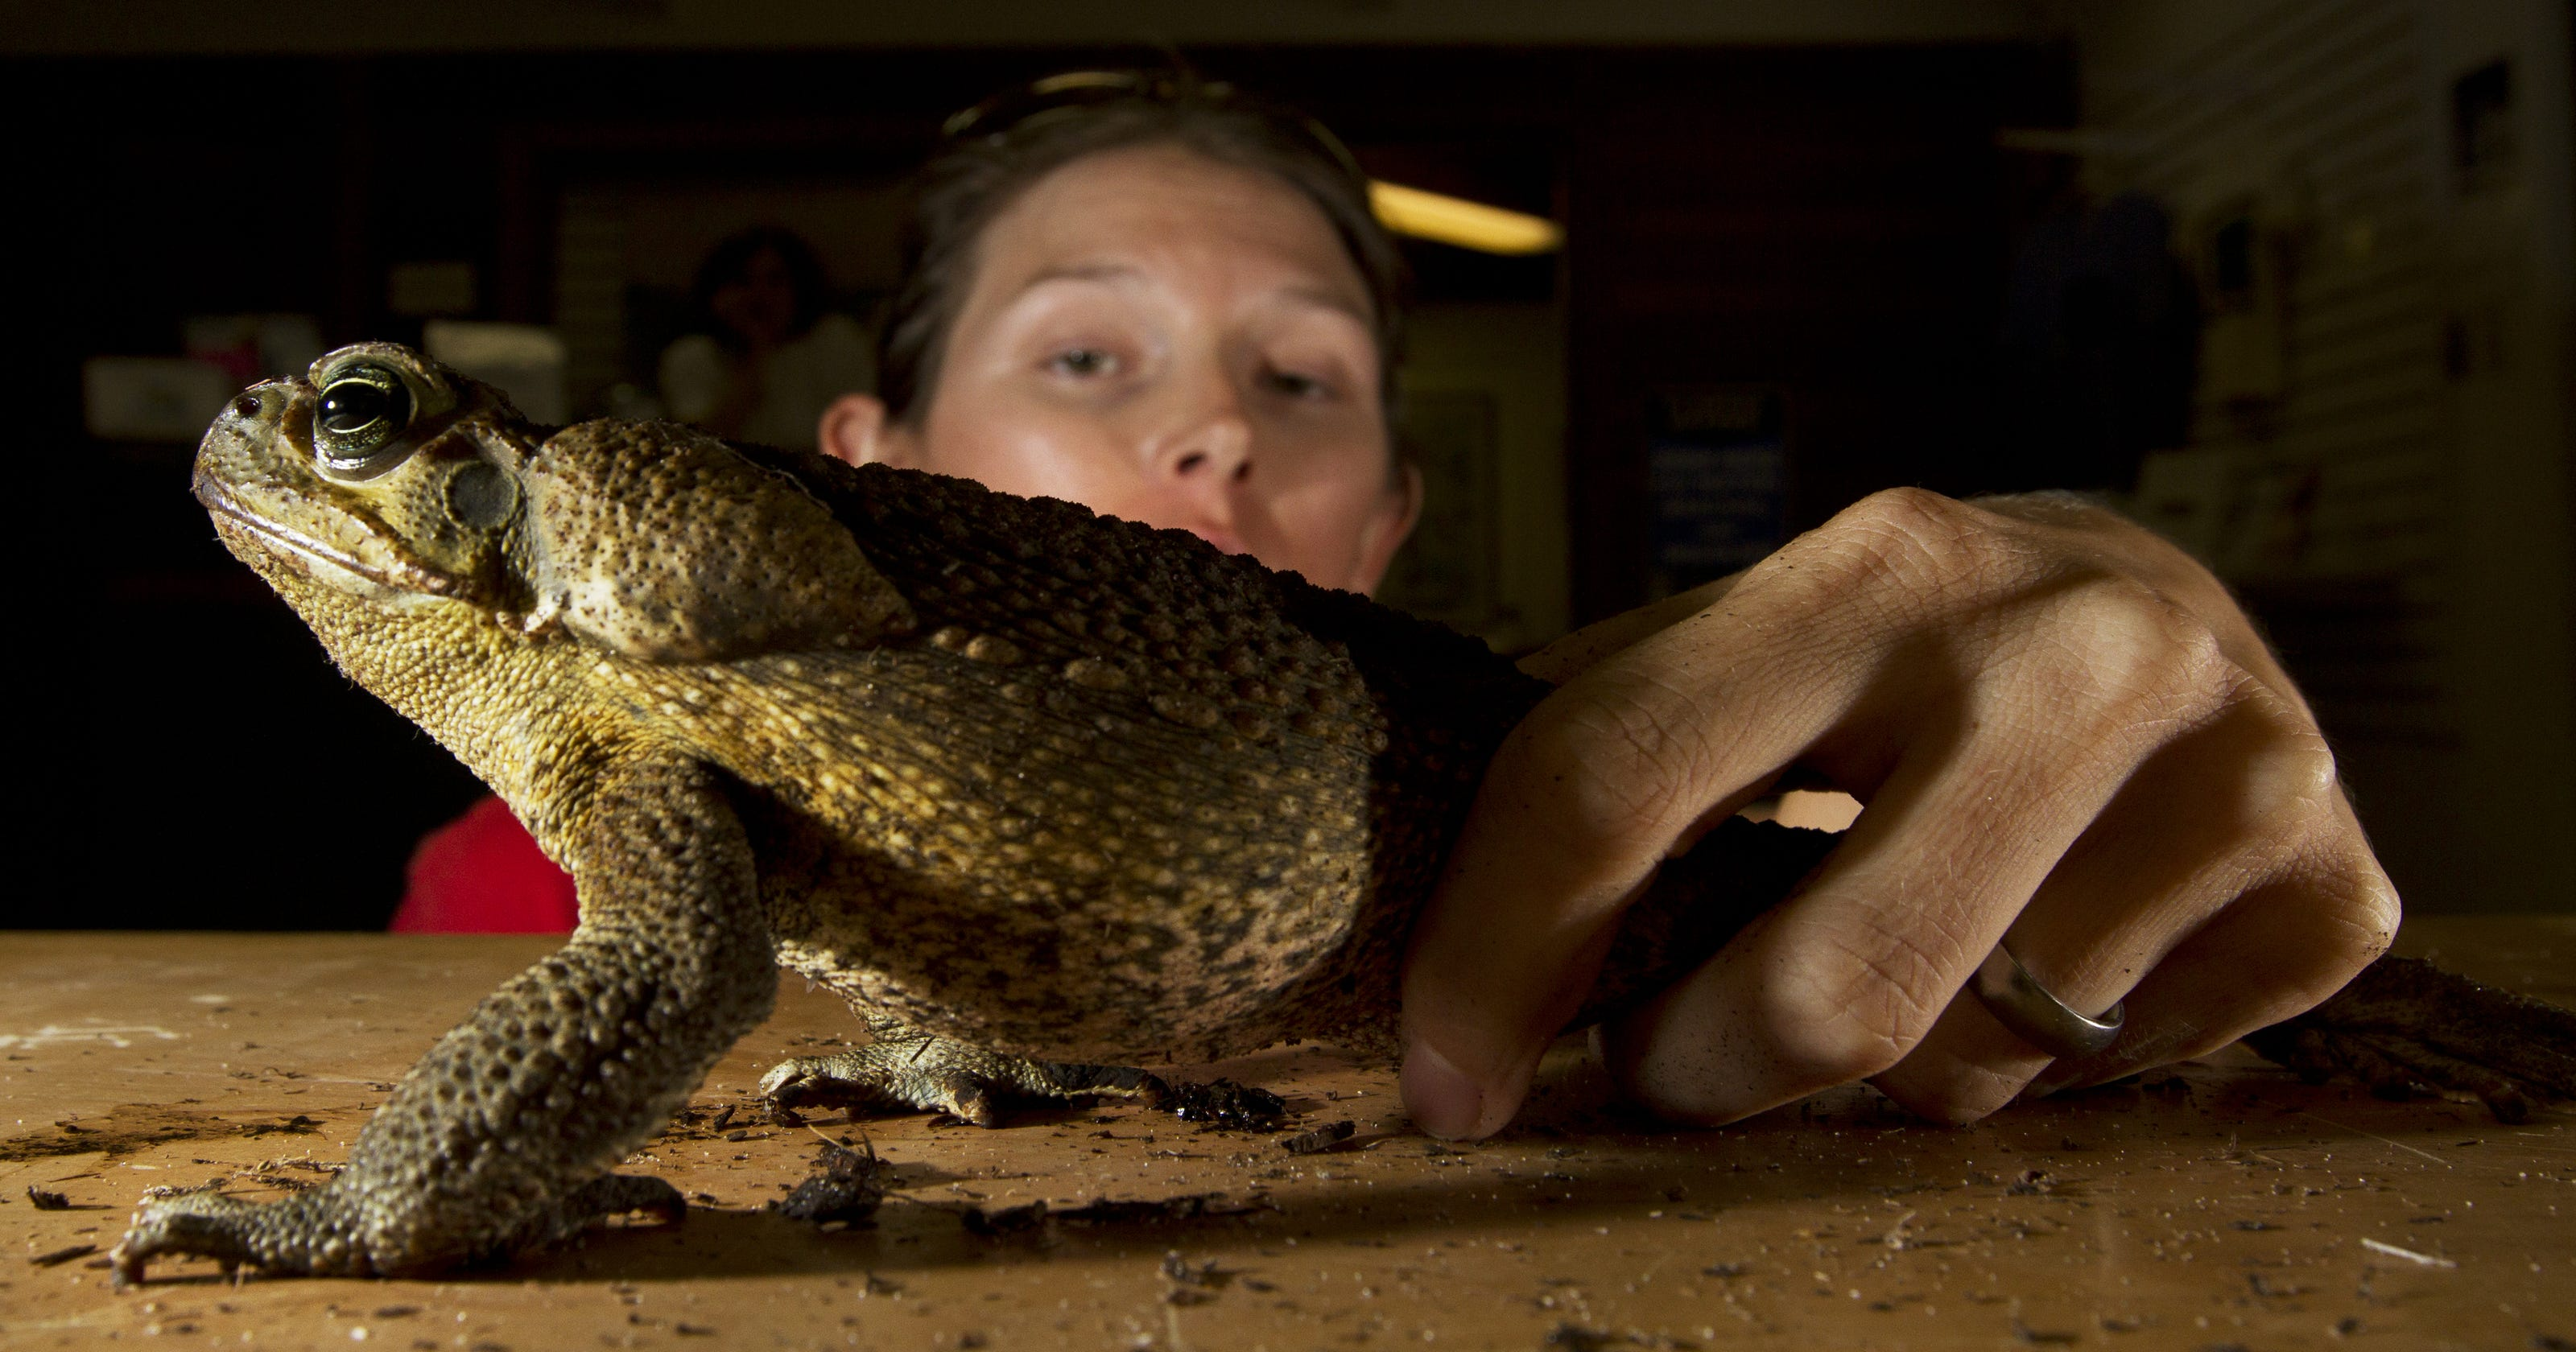 d9d3e17cd3132 Florida toads: Cane toads, aka Bufo toads, infest Palm Beach Gardens